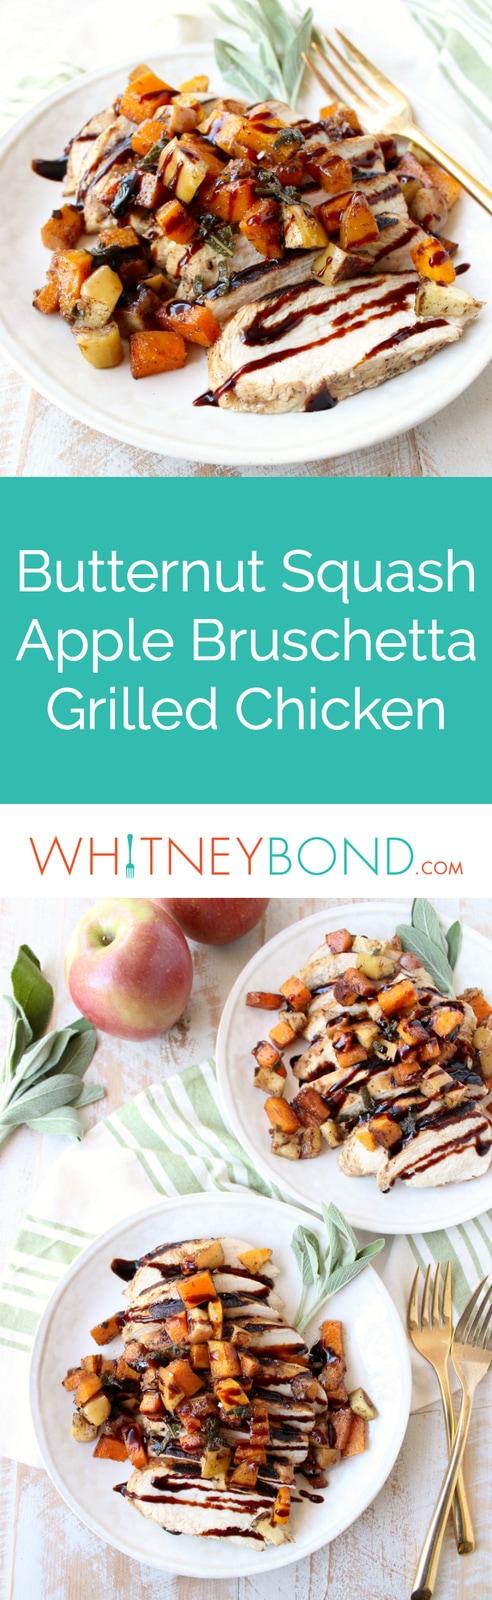 Butternut Squash Apple Bruschetta tops balsamic grilled chicken in this delicious grilled bruschetta chicken recipe that's gluten free, dairy free & made in only 29 minutes!